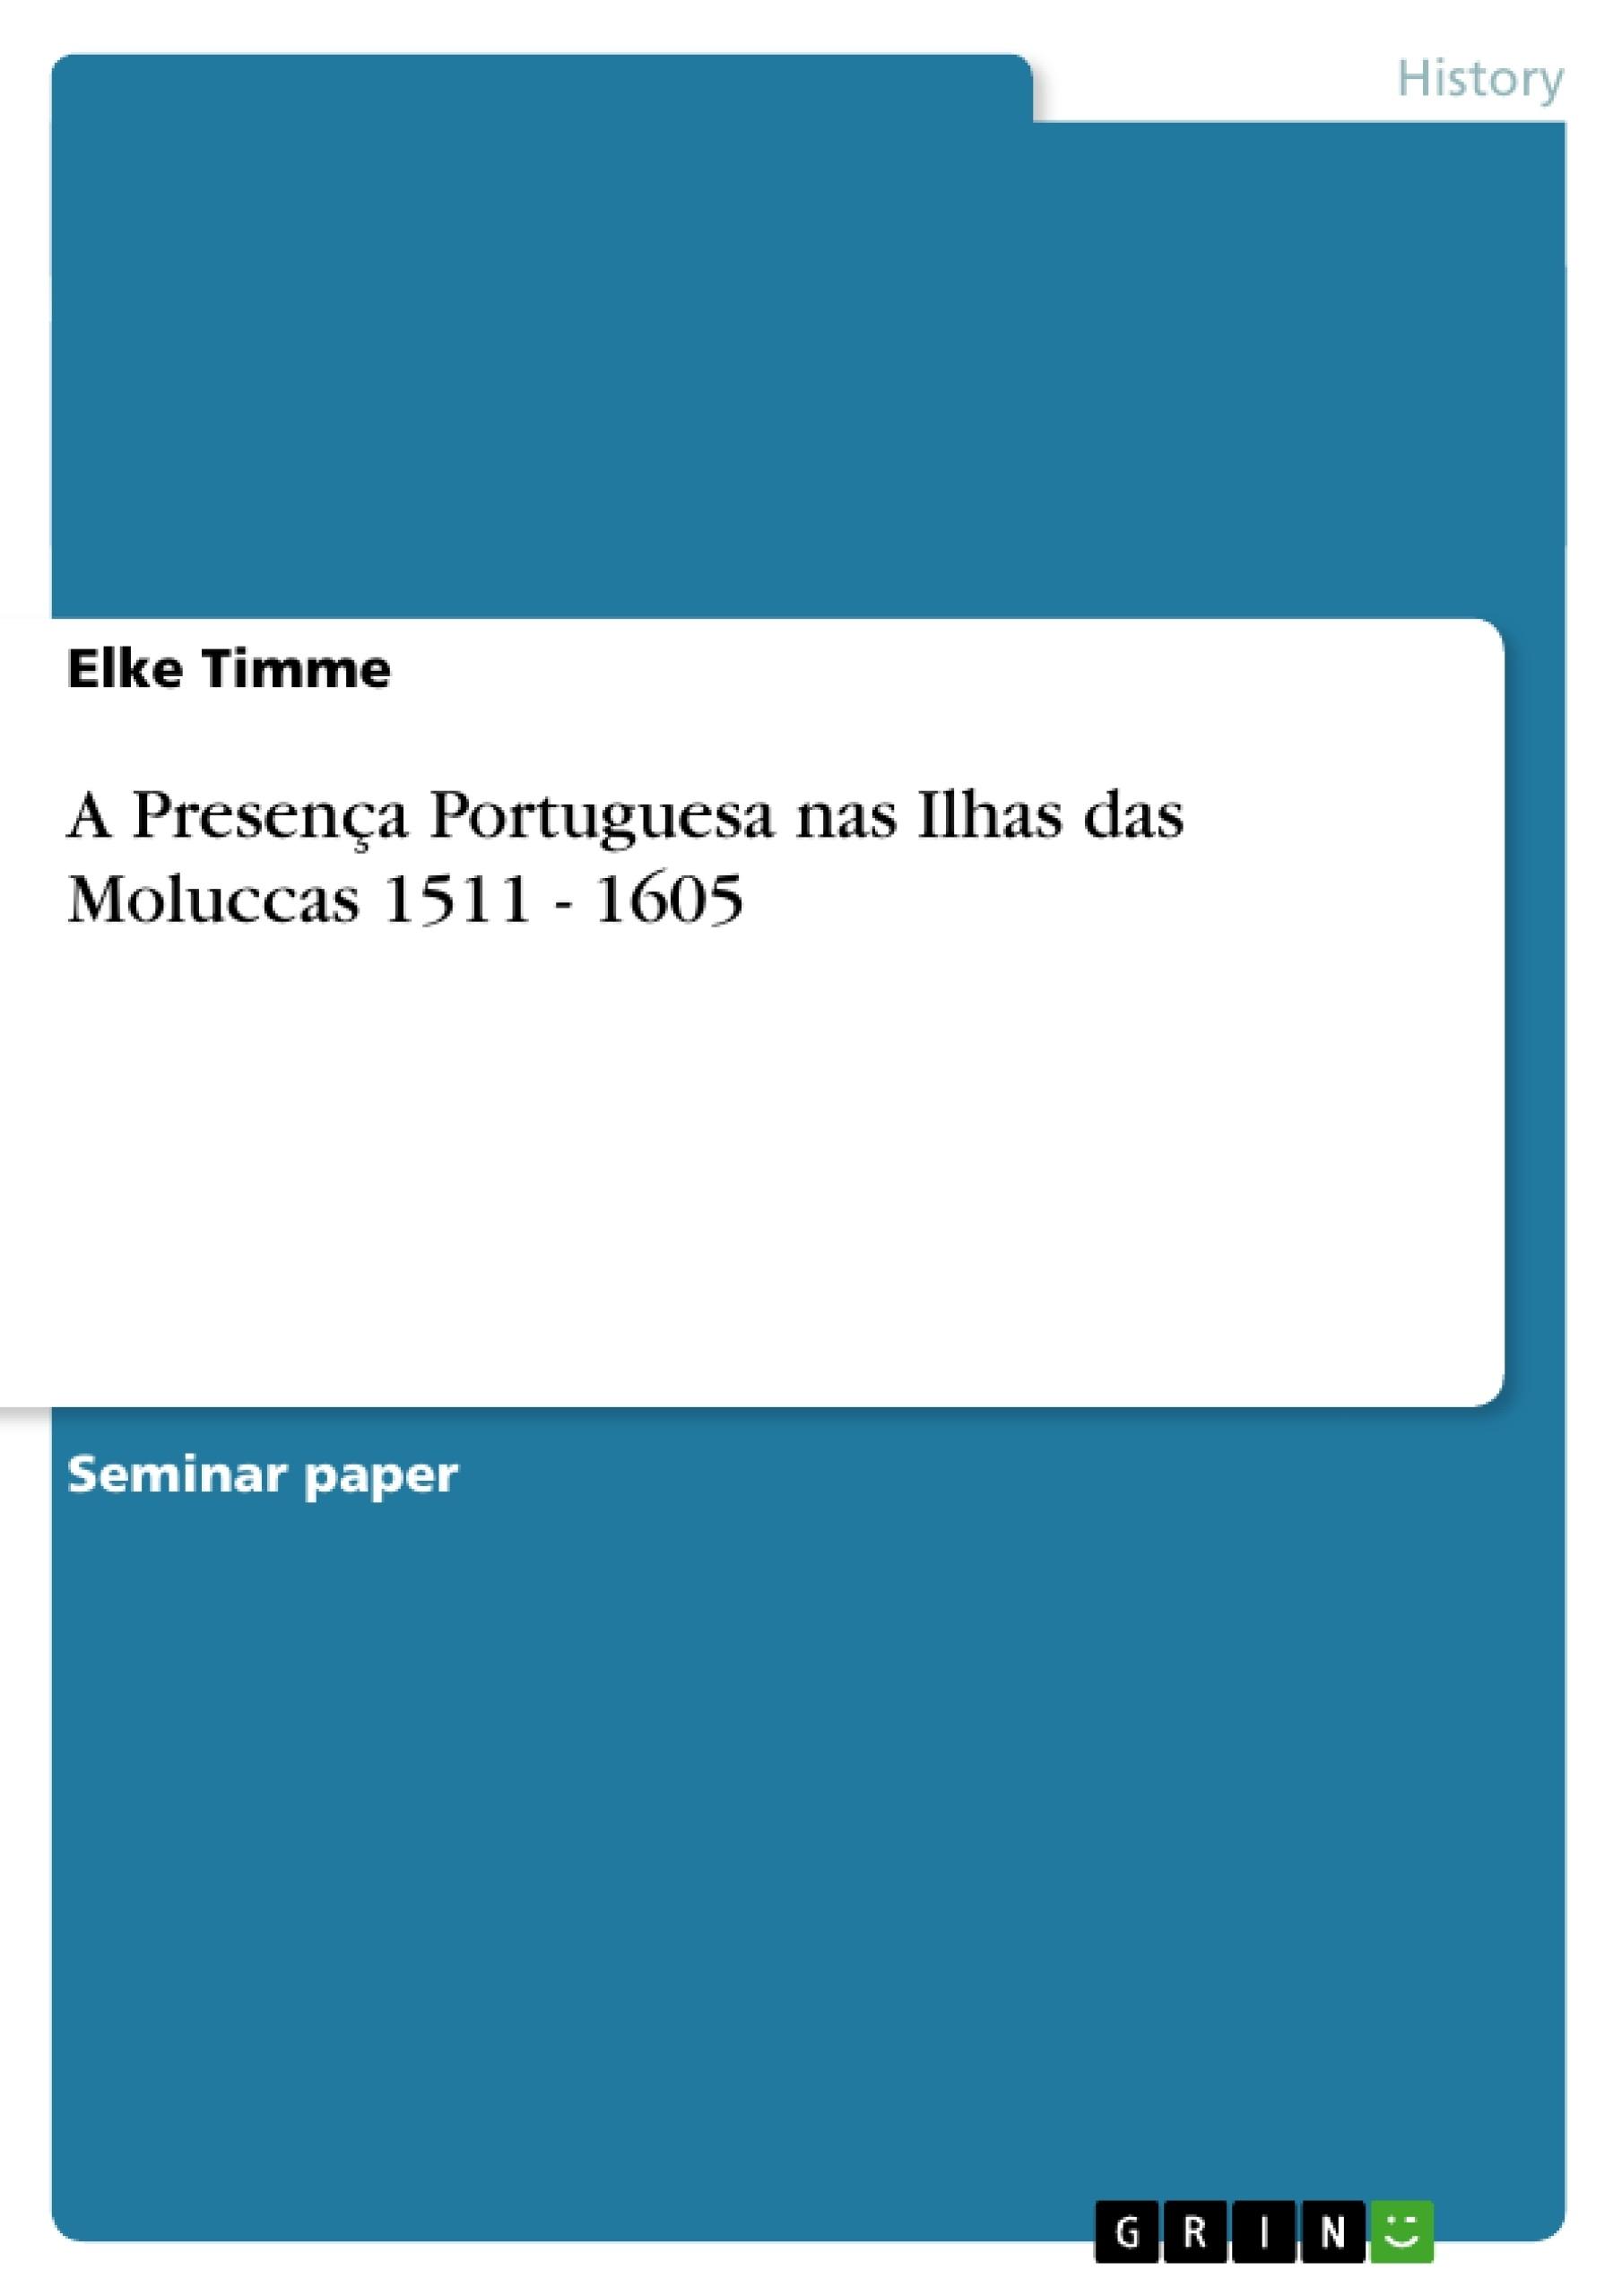 Title: A Presença Portuguesa nas Ilhas das Moluccas 1511 - 1605